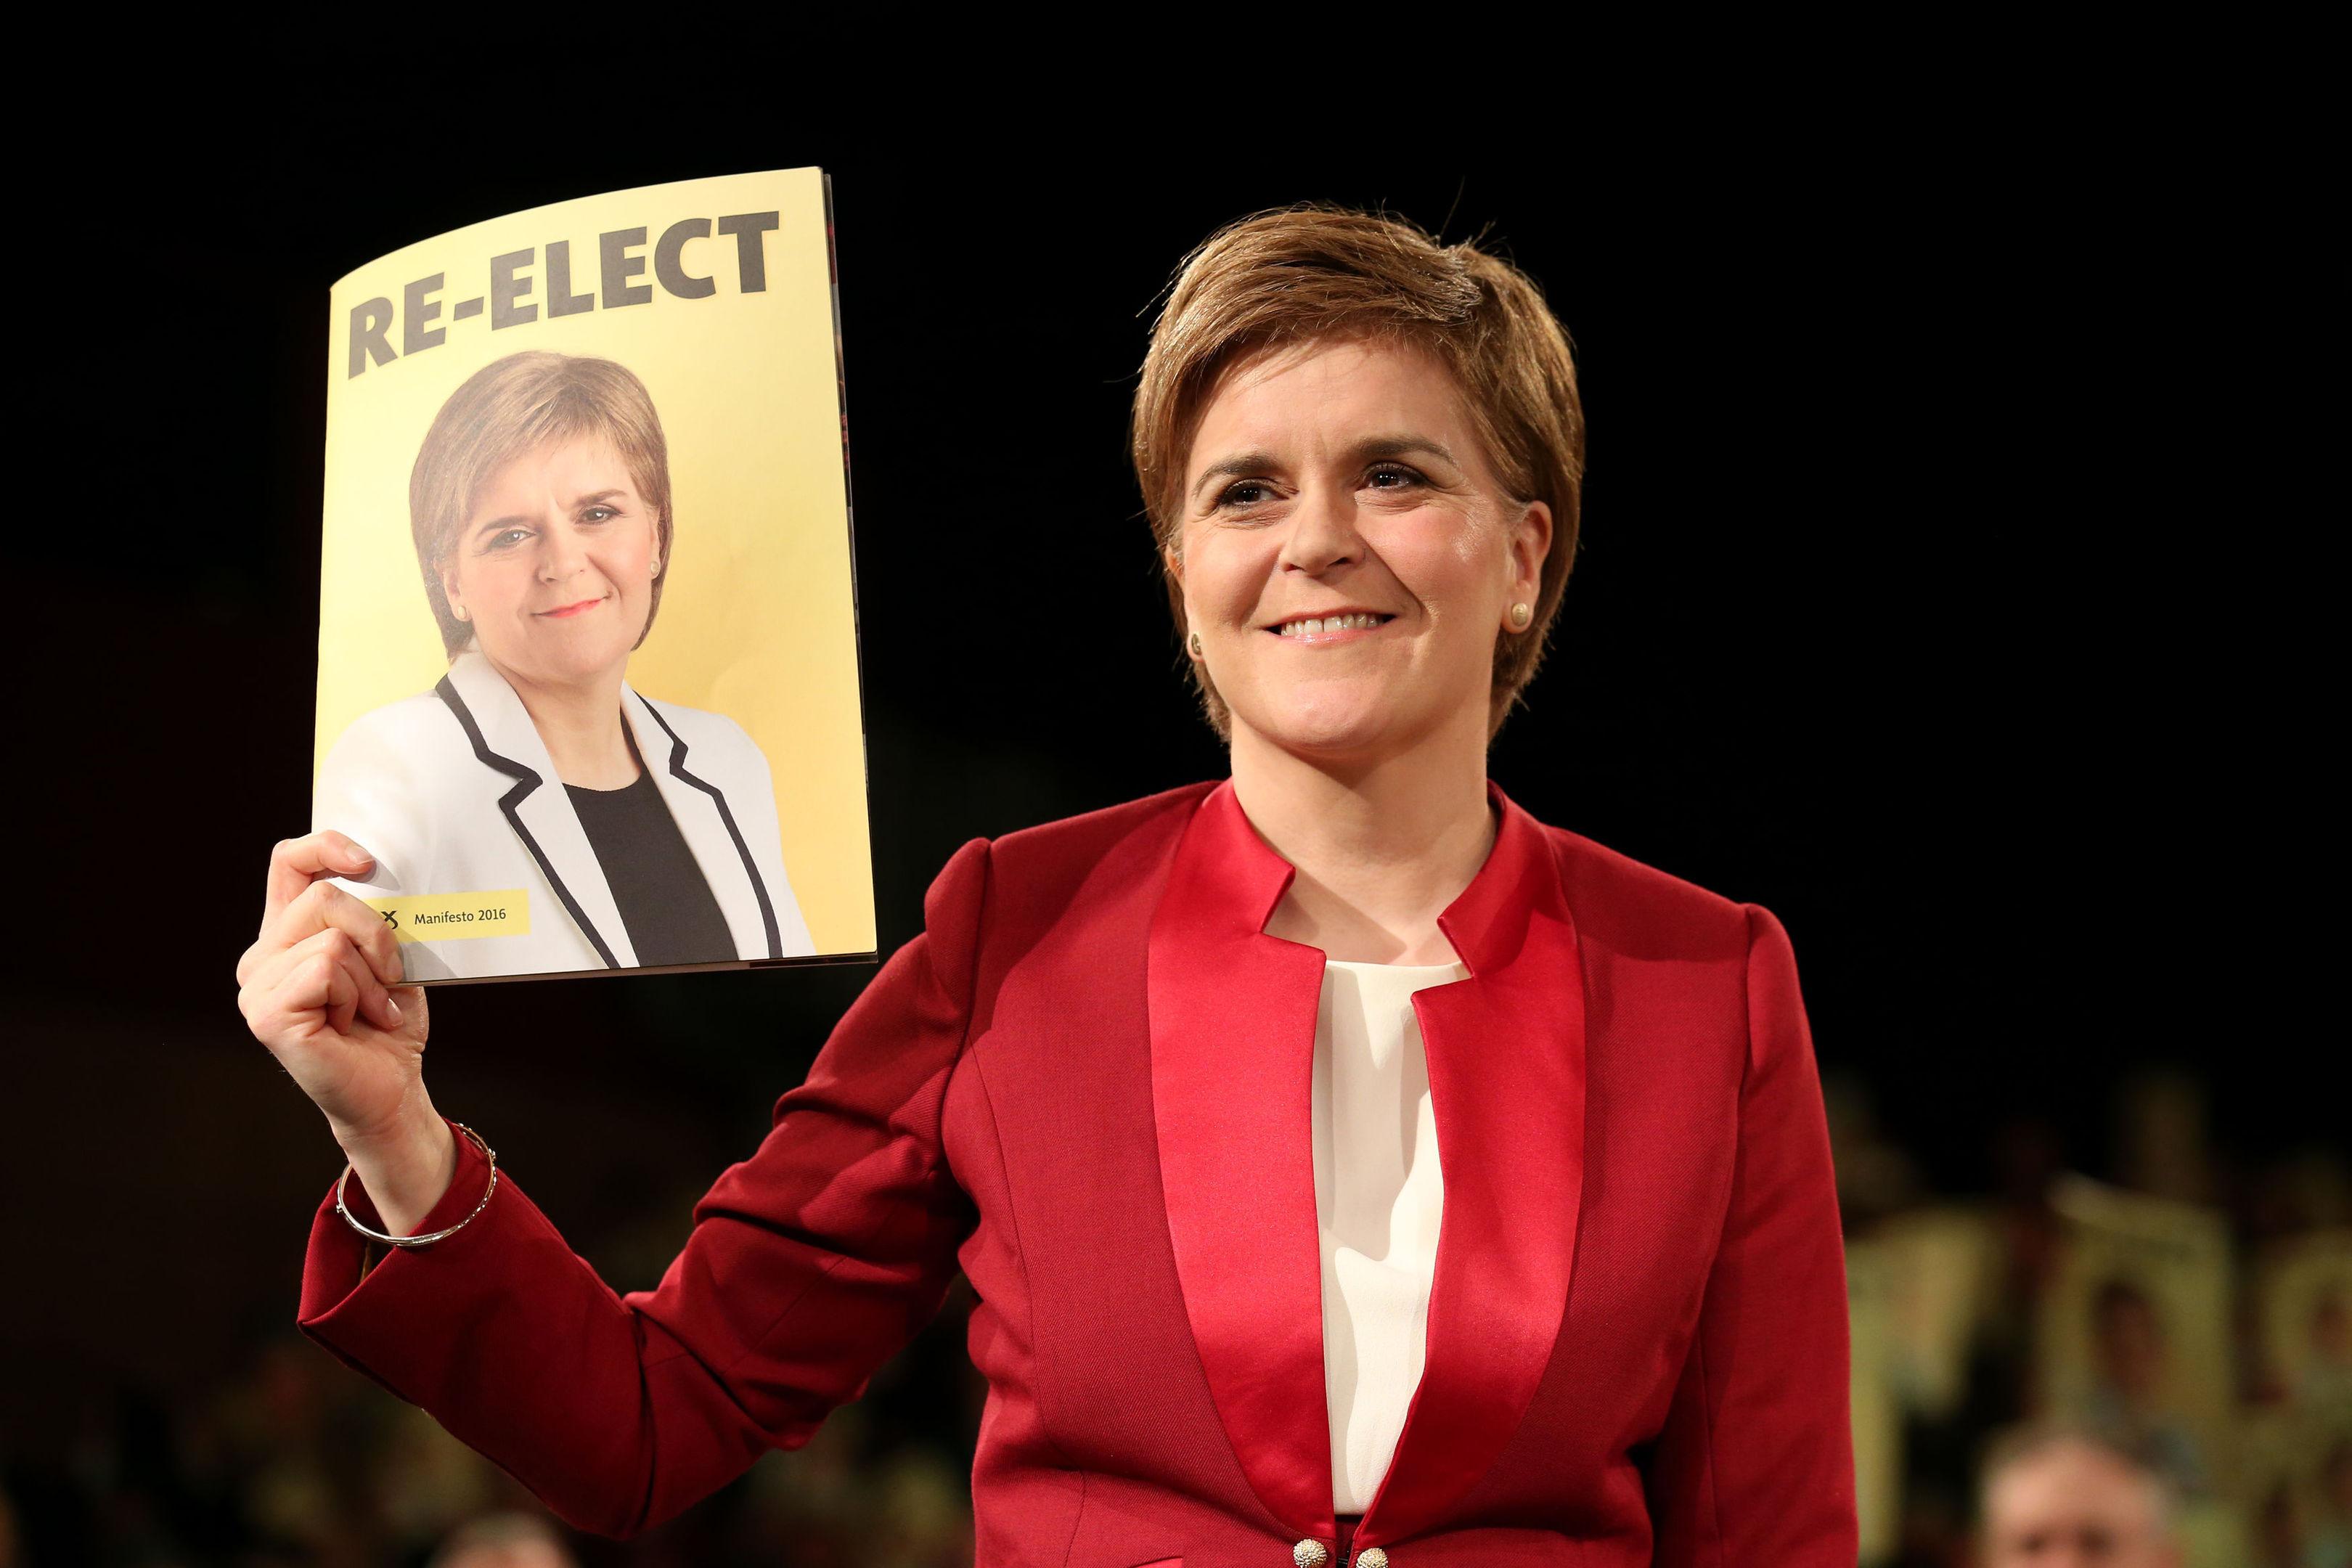 SNP leader Nicola Sturgeon launches the party's Scottish Parliament election manifesto at the Edinburgh International Conference Centre.